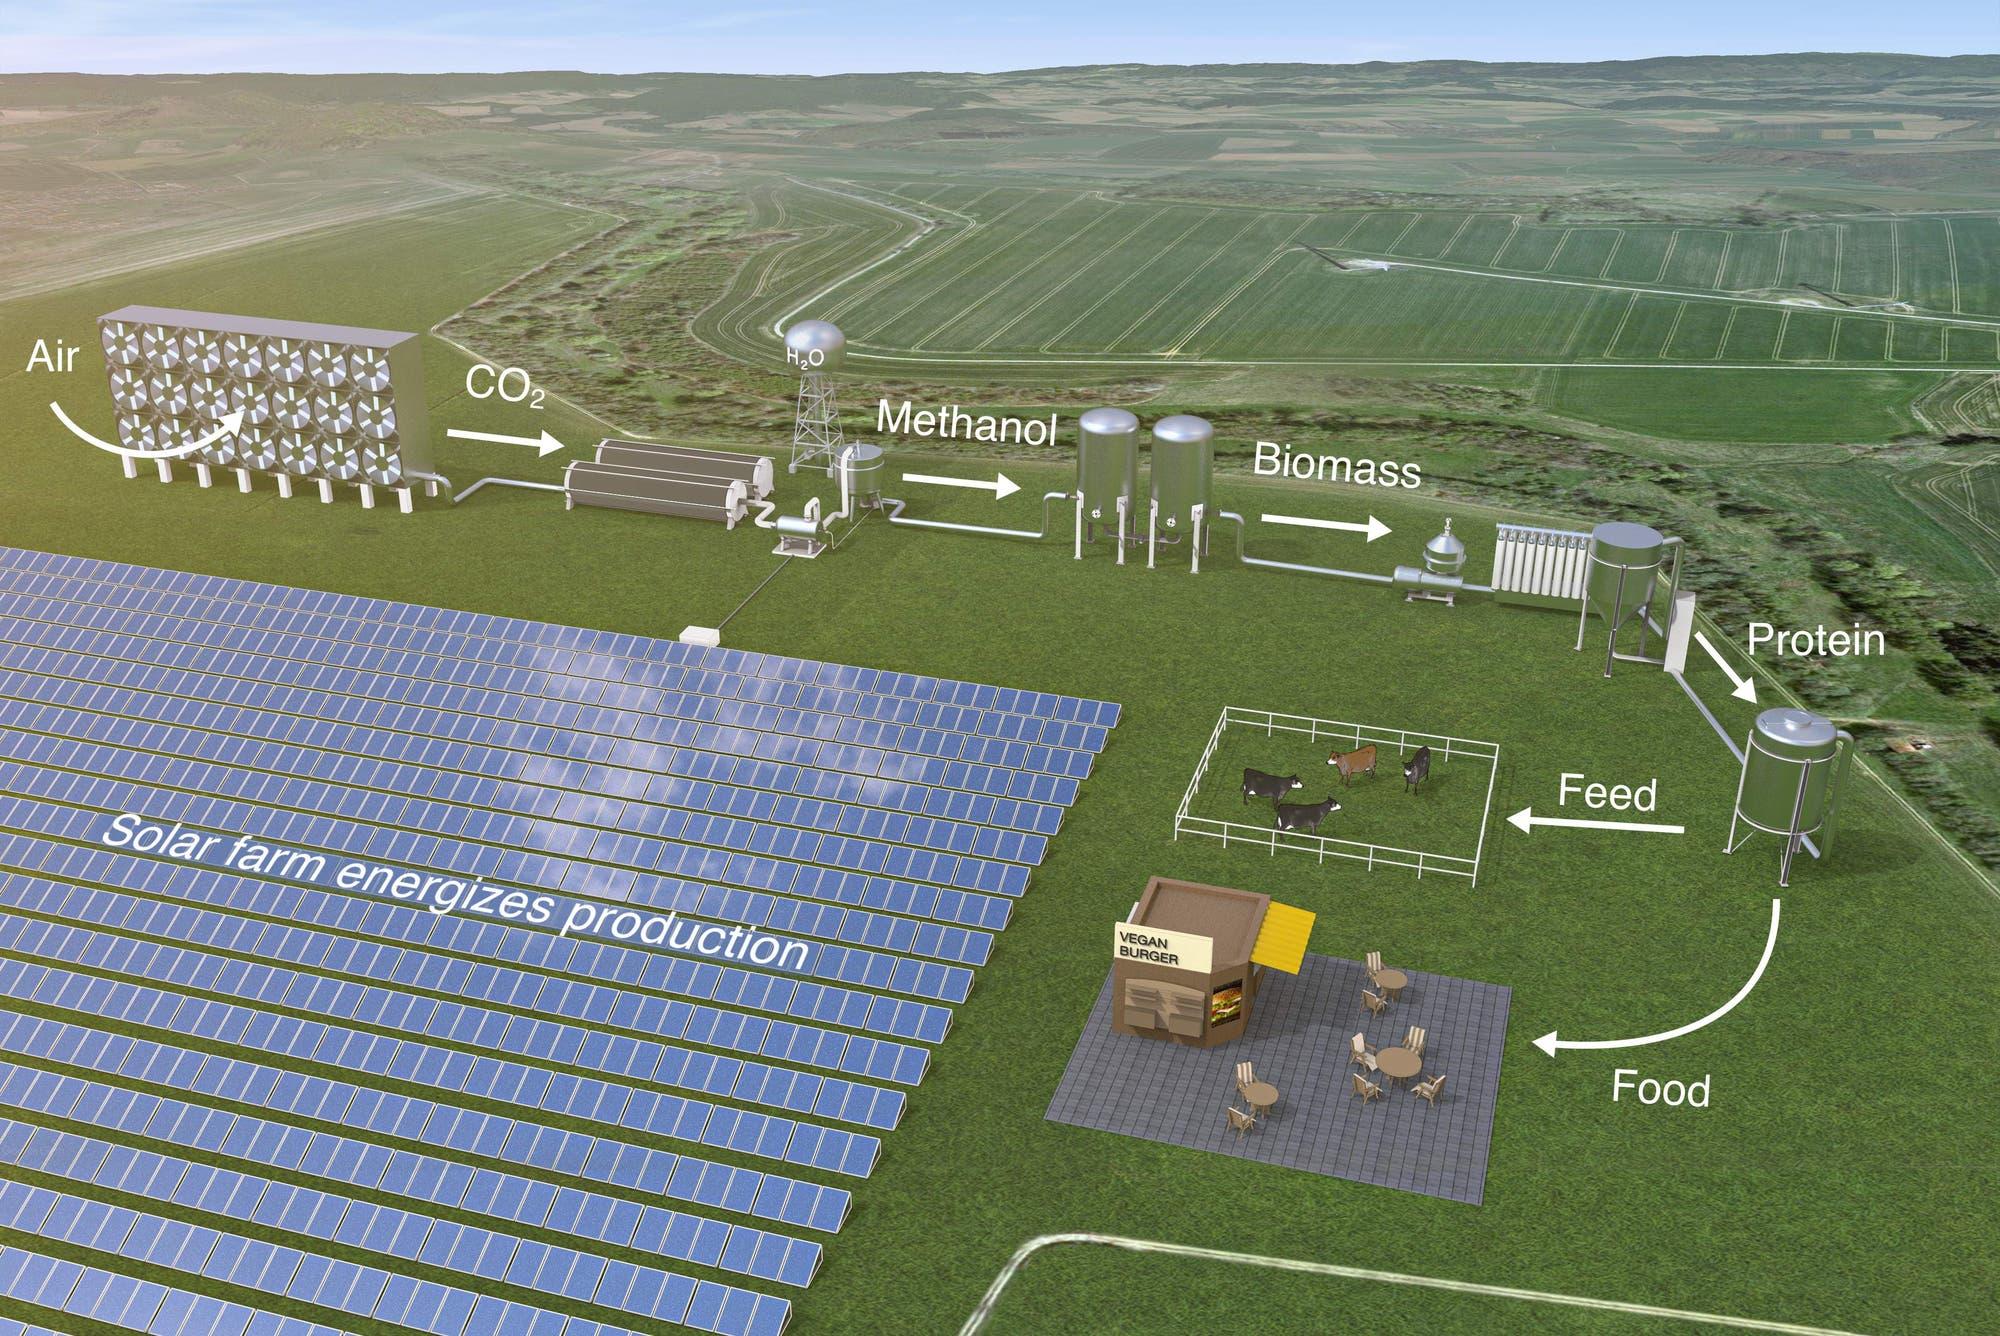 Solarbetriebene Bakterienfarm